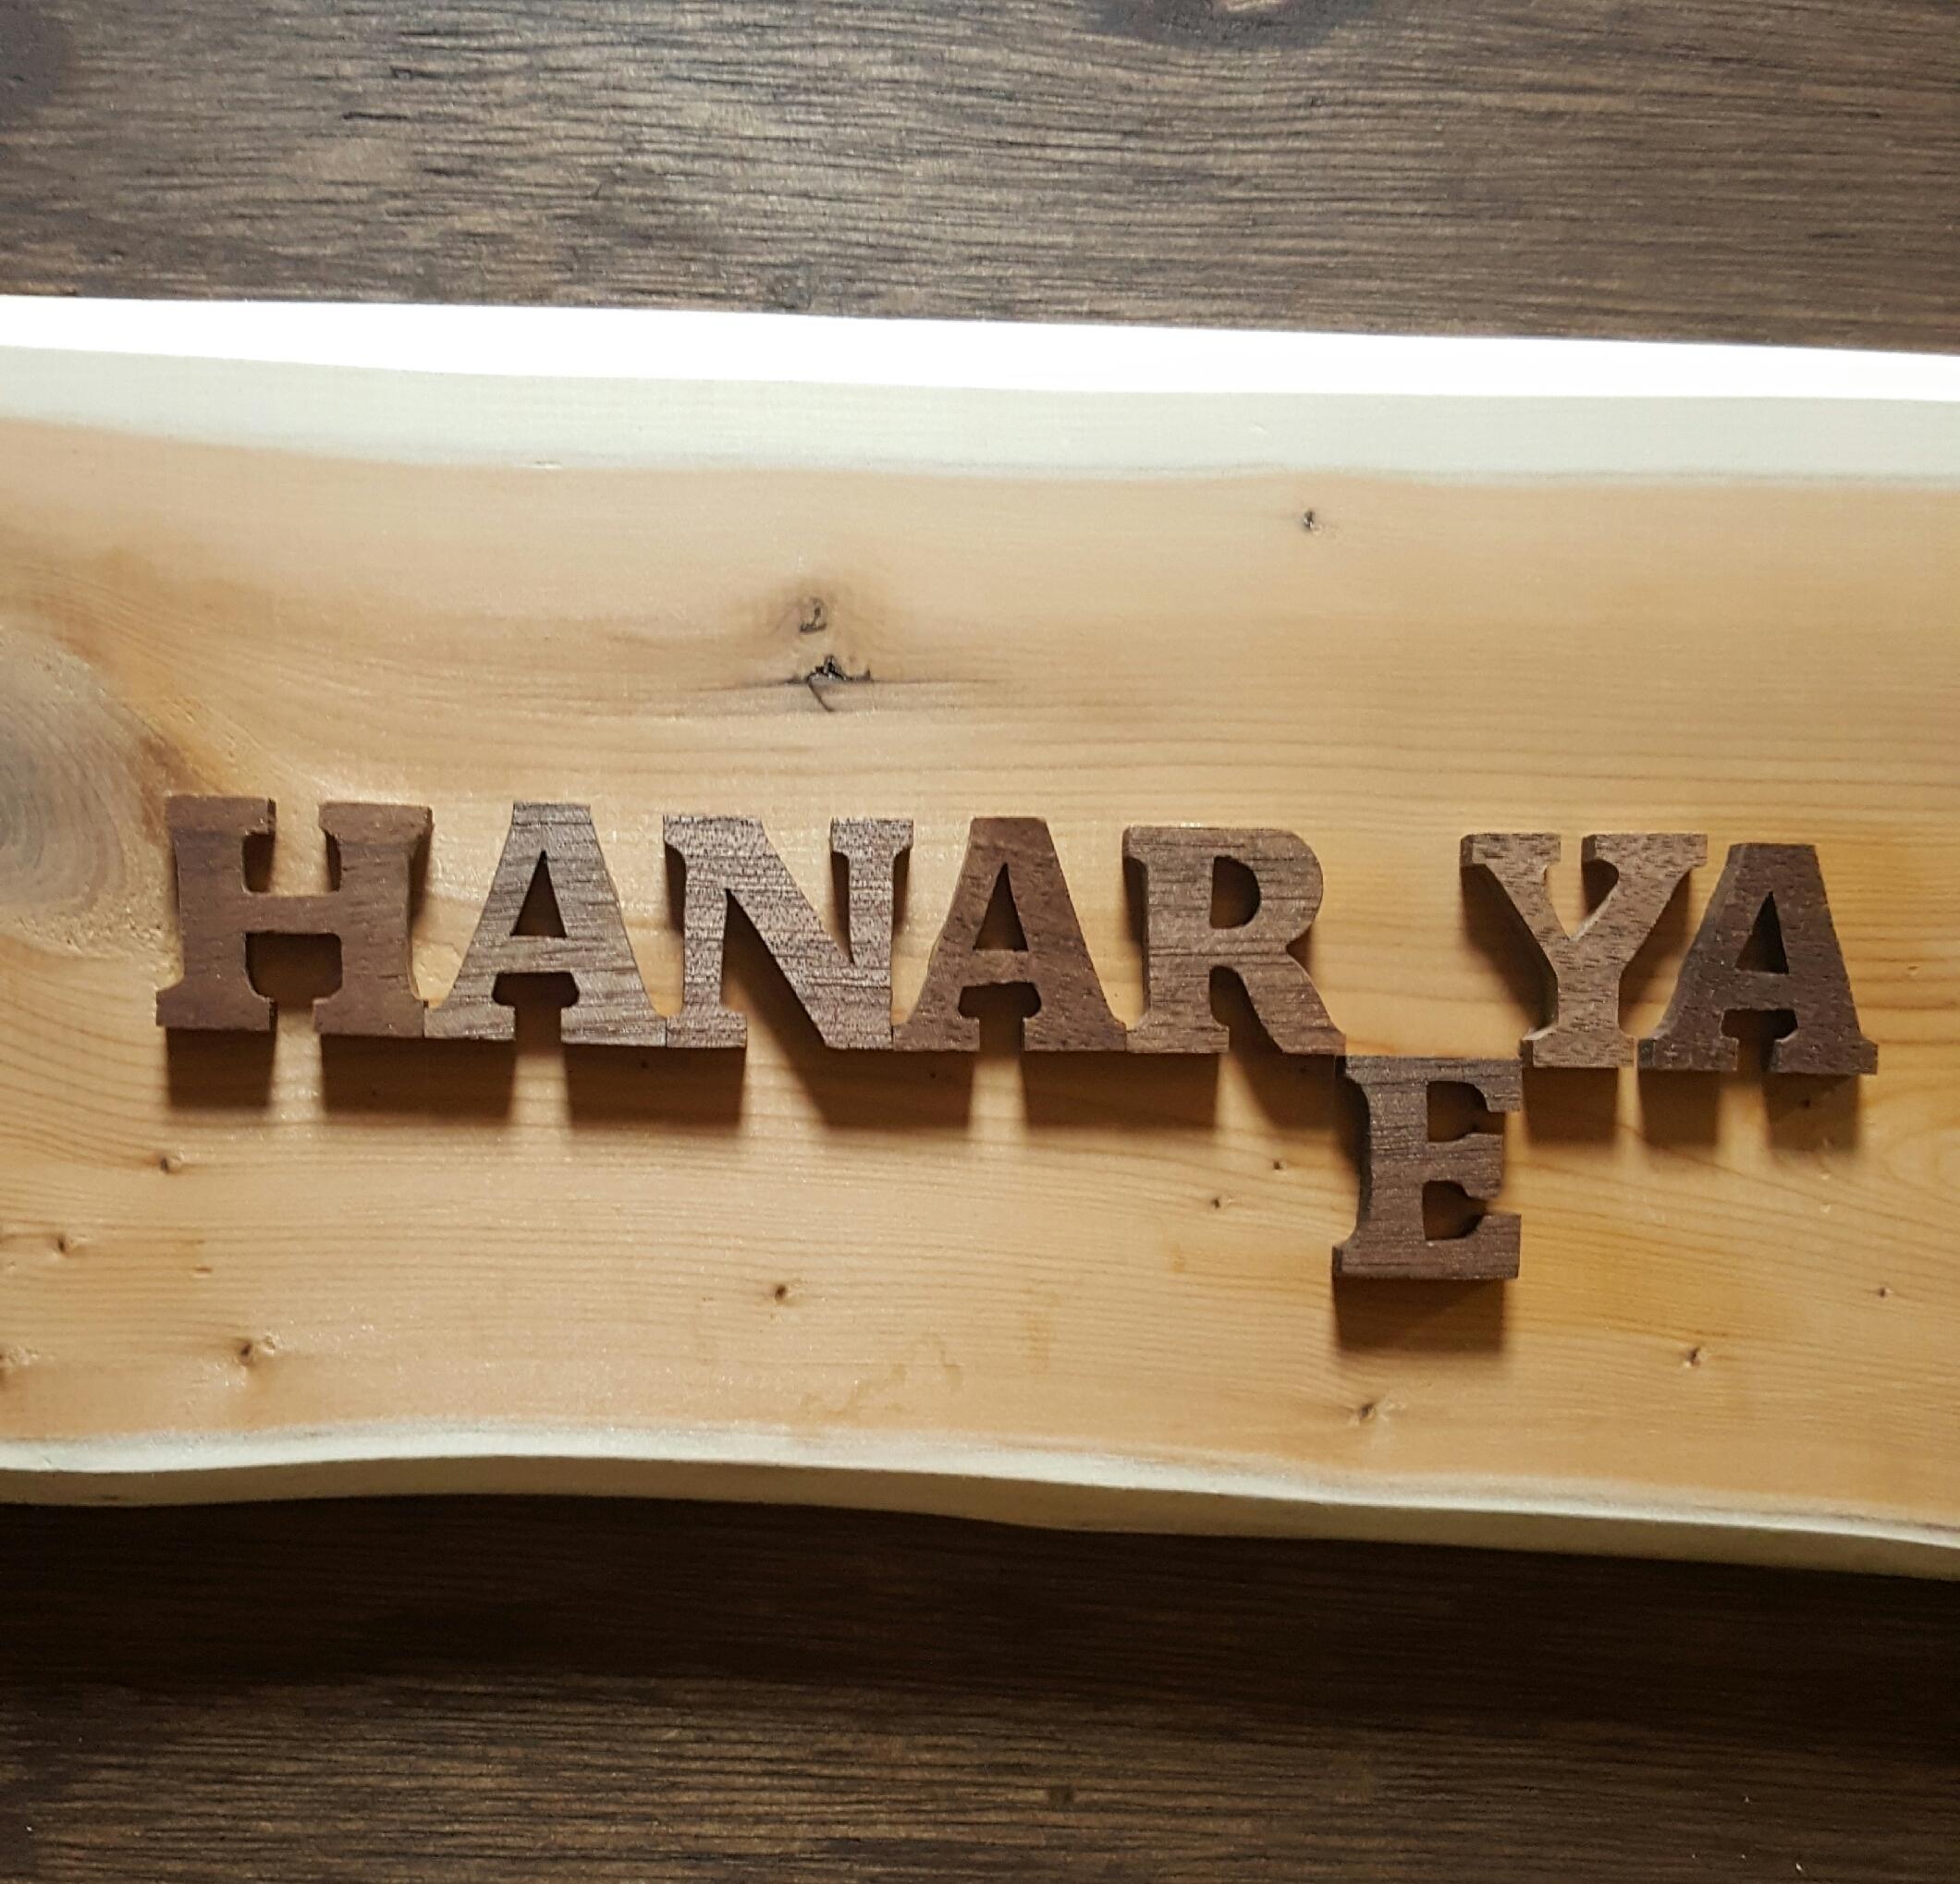 HANAREYA